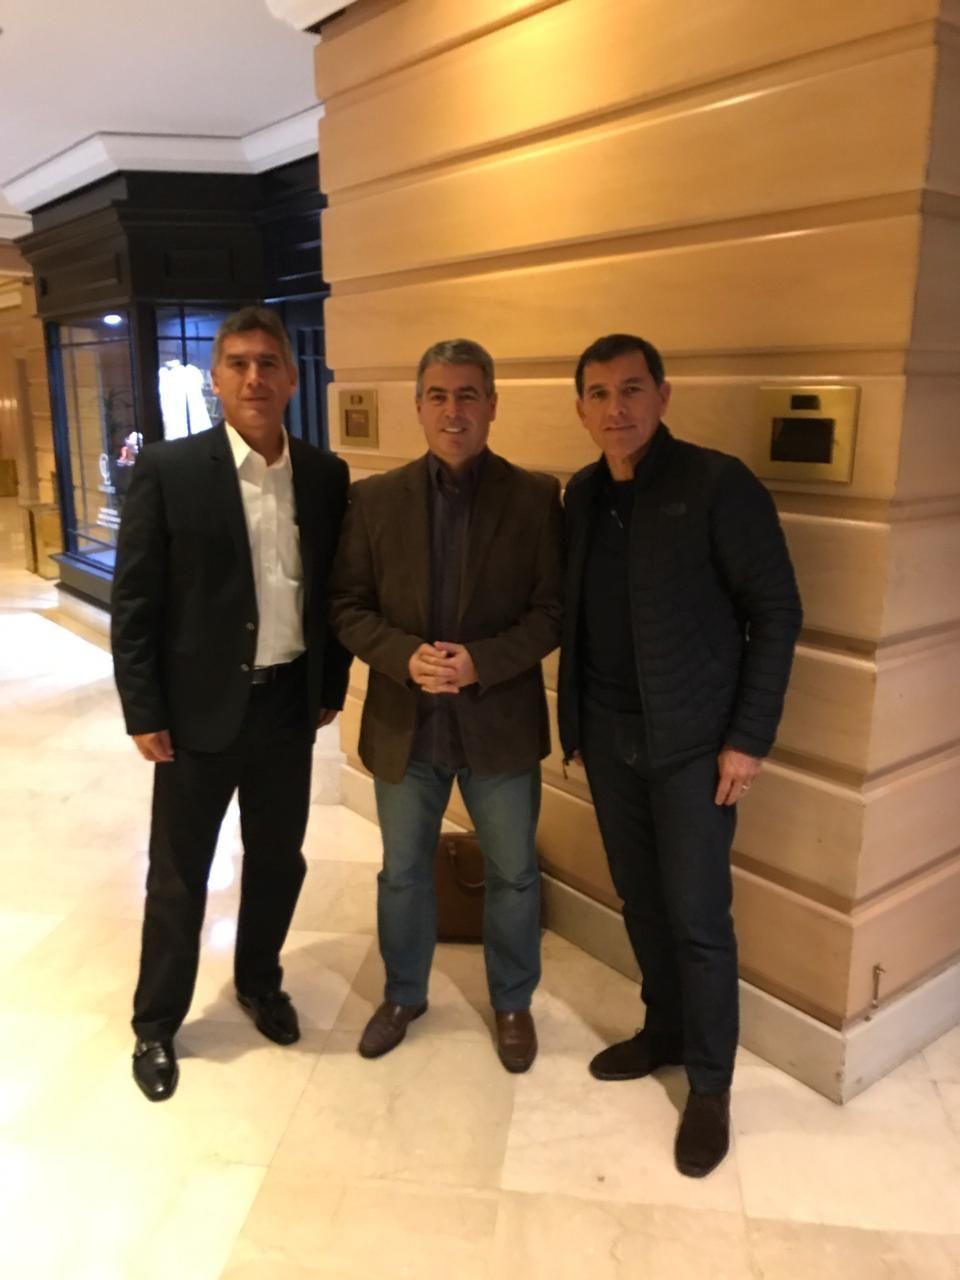 Pablo Bengoechea, junto a Gustavo Zevallos y Renzo Ratto.